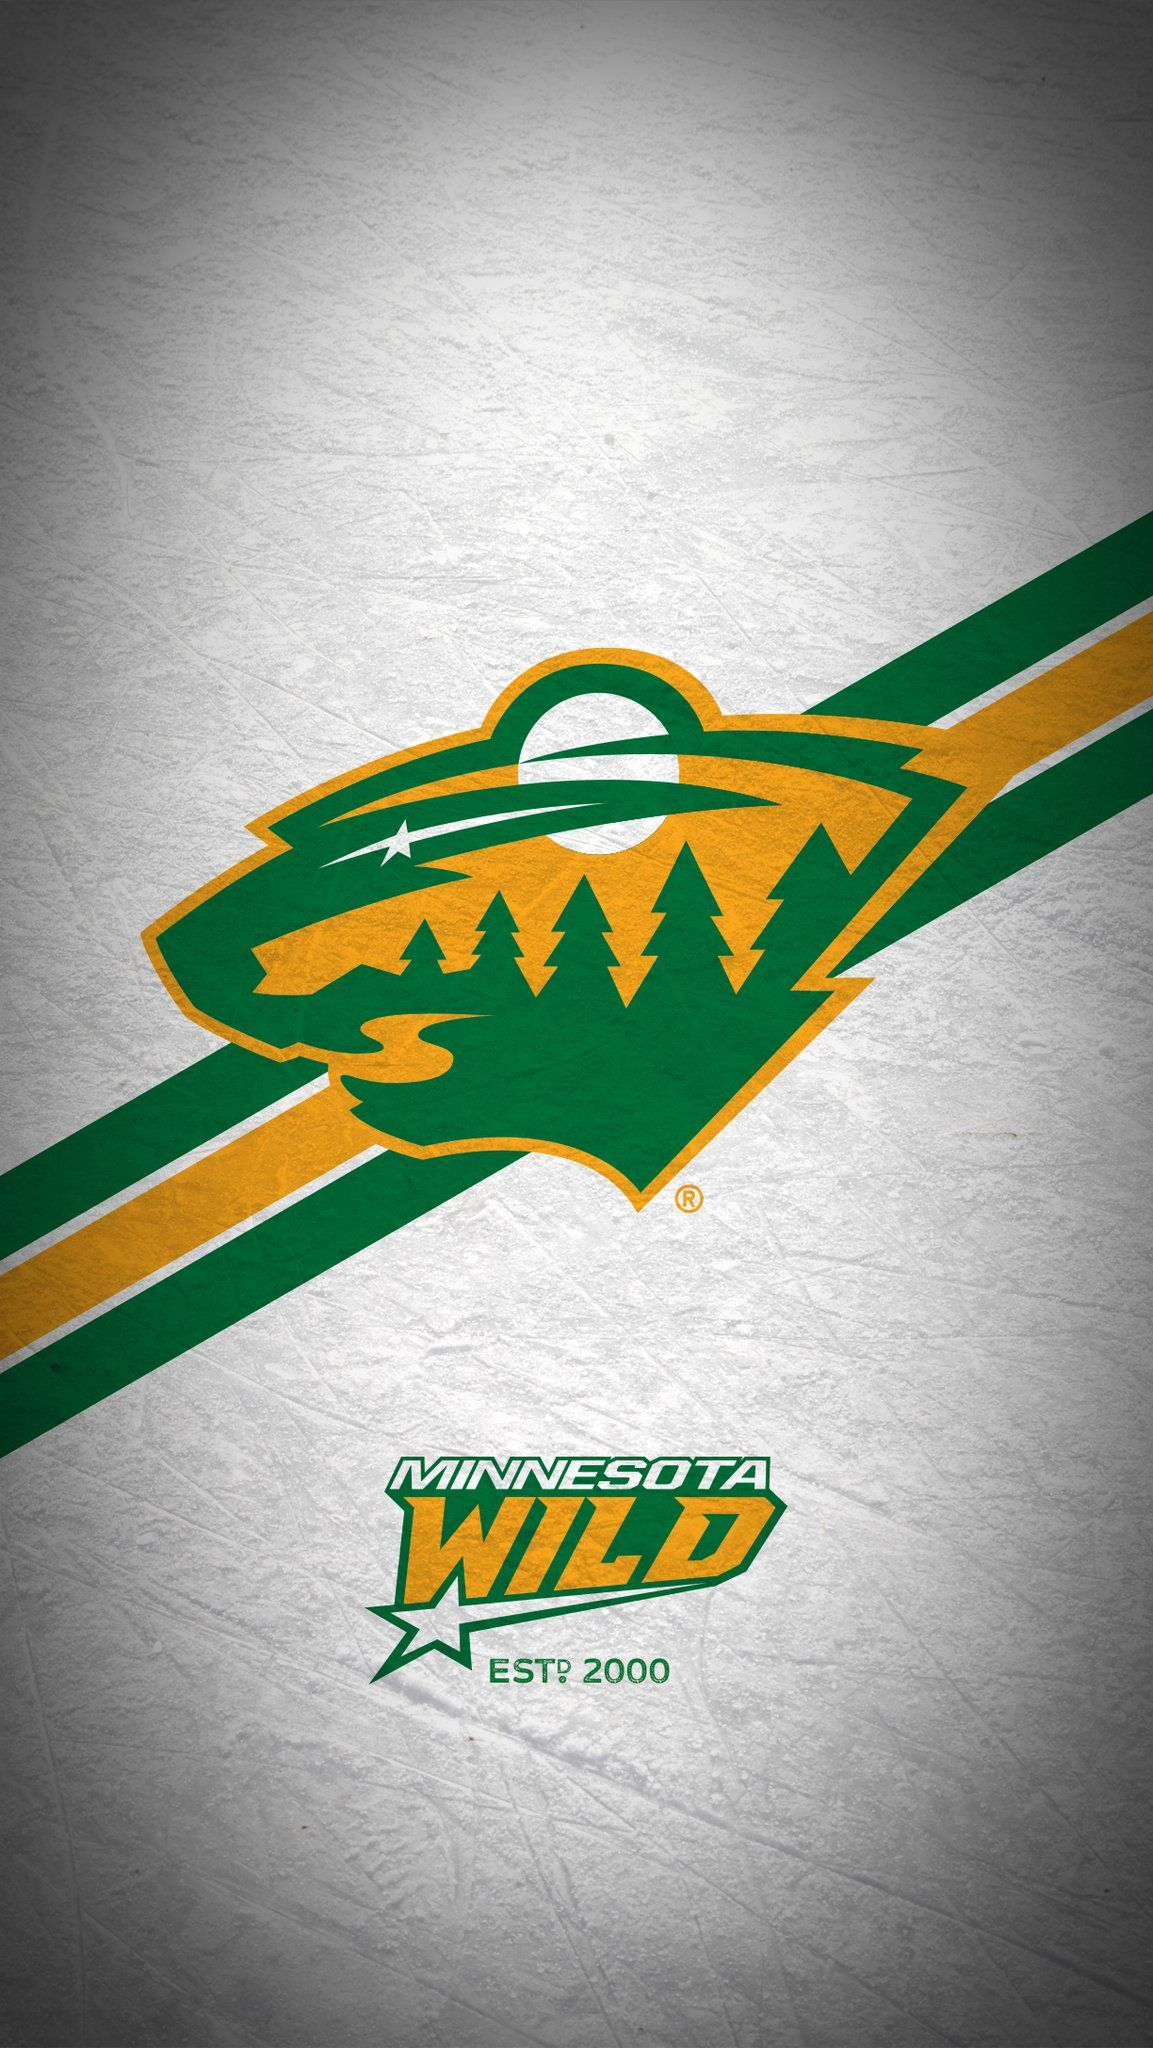 Minnesota Wild On Twitter Minnesota Wild Team Emblems Minnesota